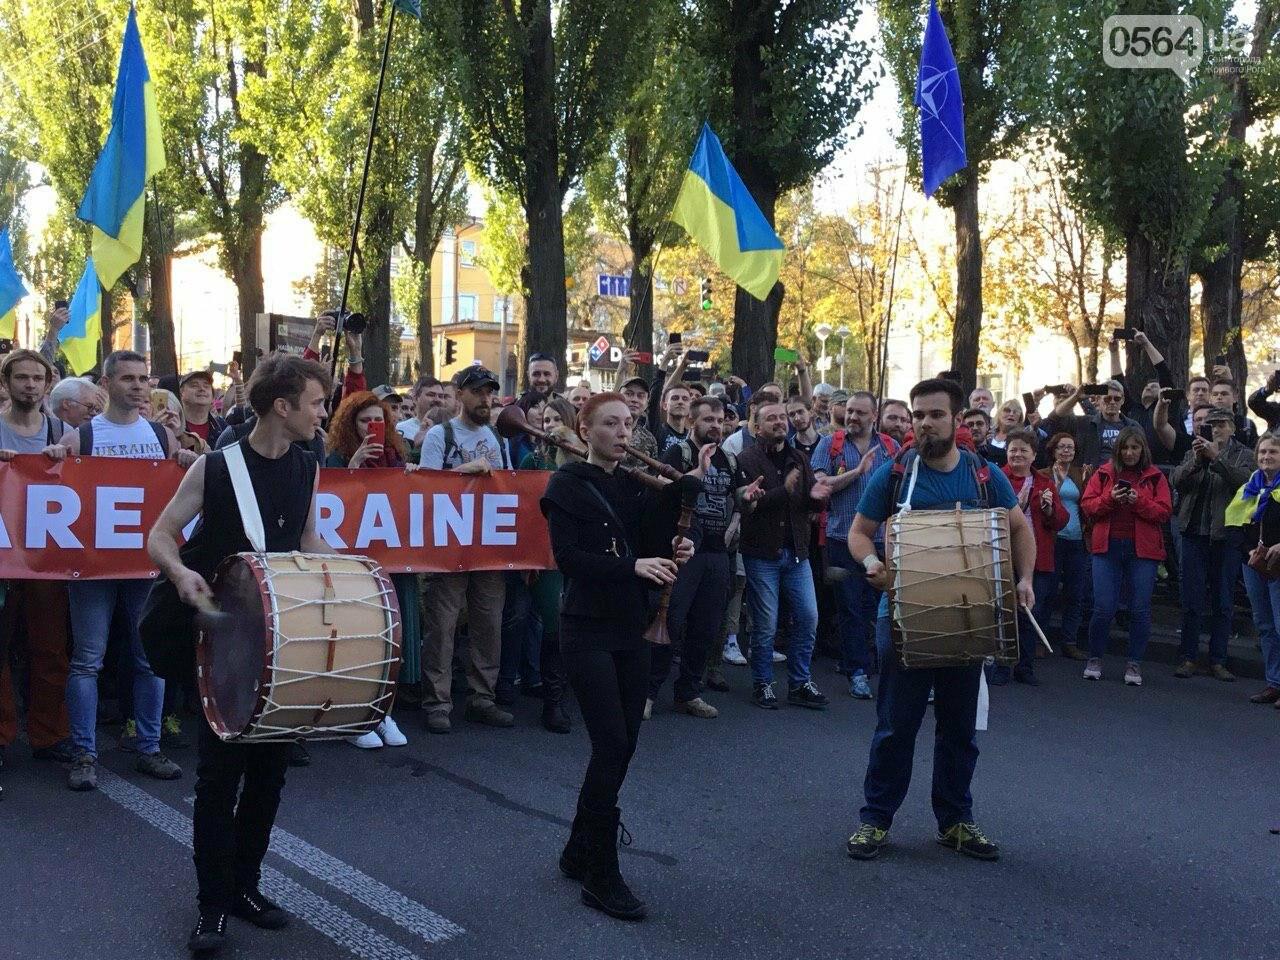 Криворожане поддержали Марш сопротивления капитуляции в Киеве, - ФОТО, ВИДЕО, ОБНОВЛЕНО, фото-12